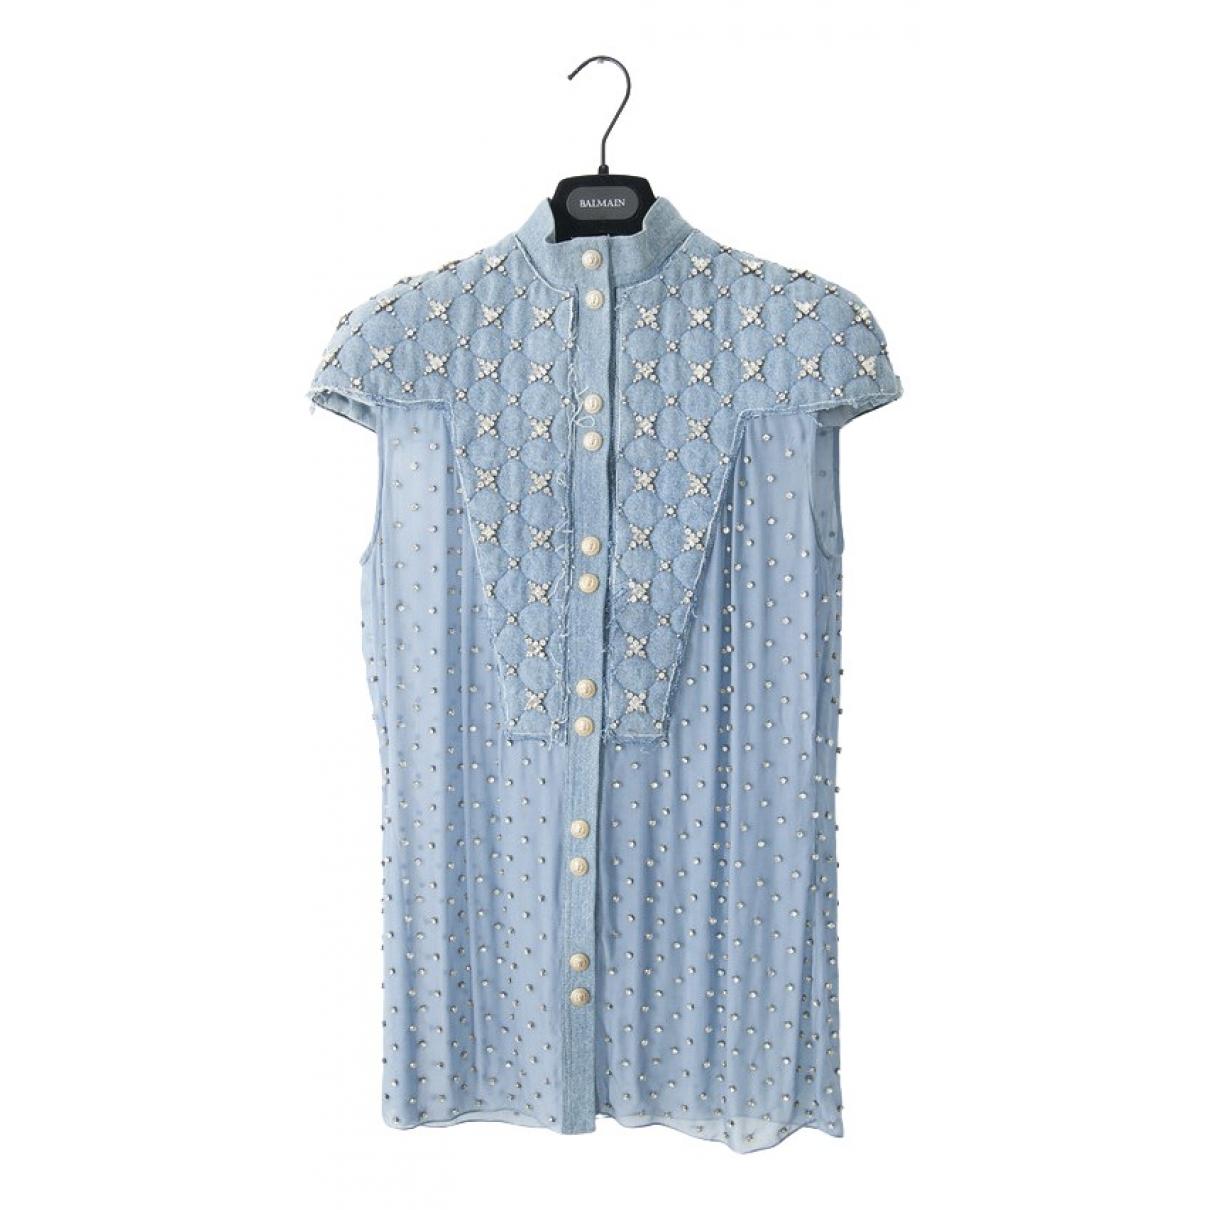 Balmain \N Blue Denim - Jeans  top for Women 36 FR